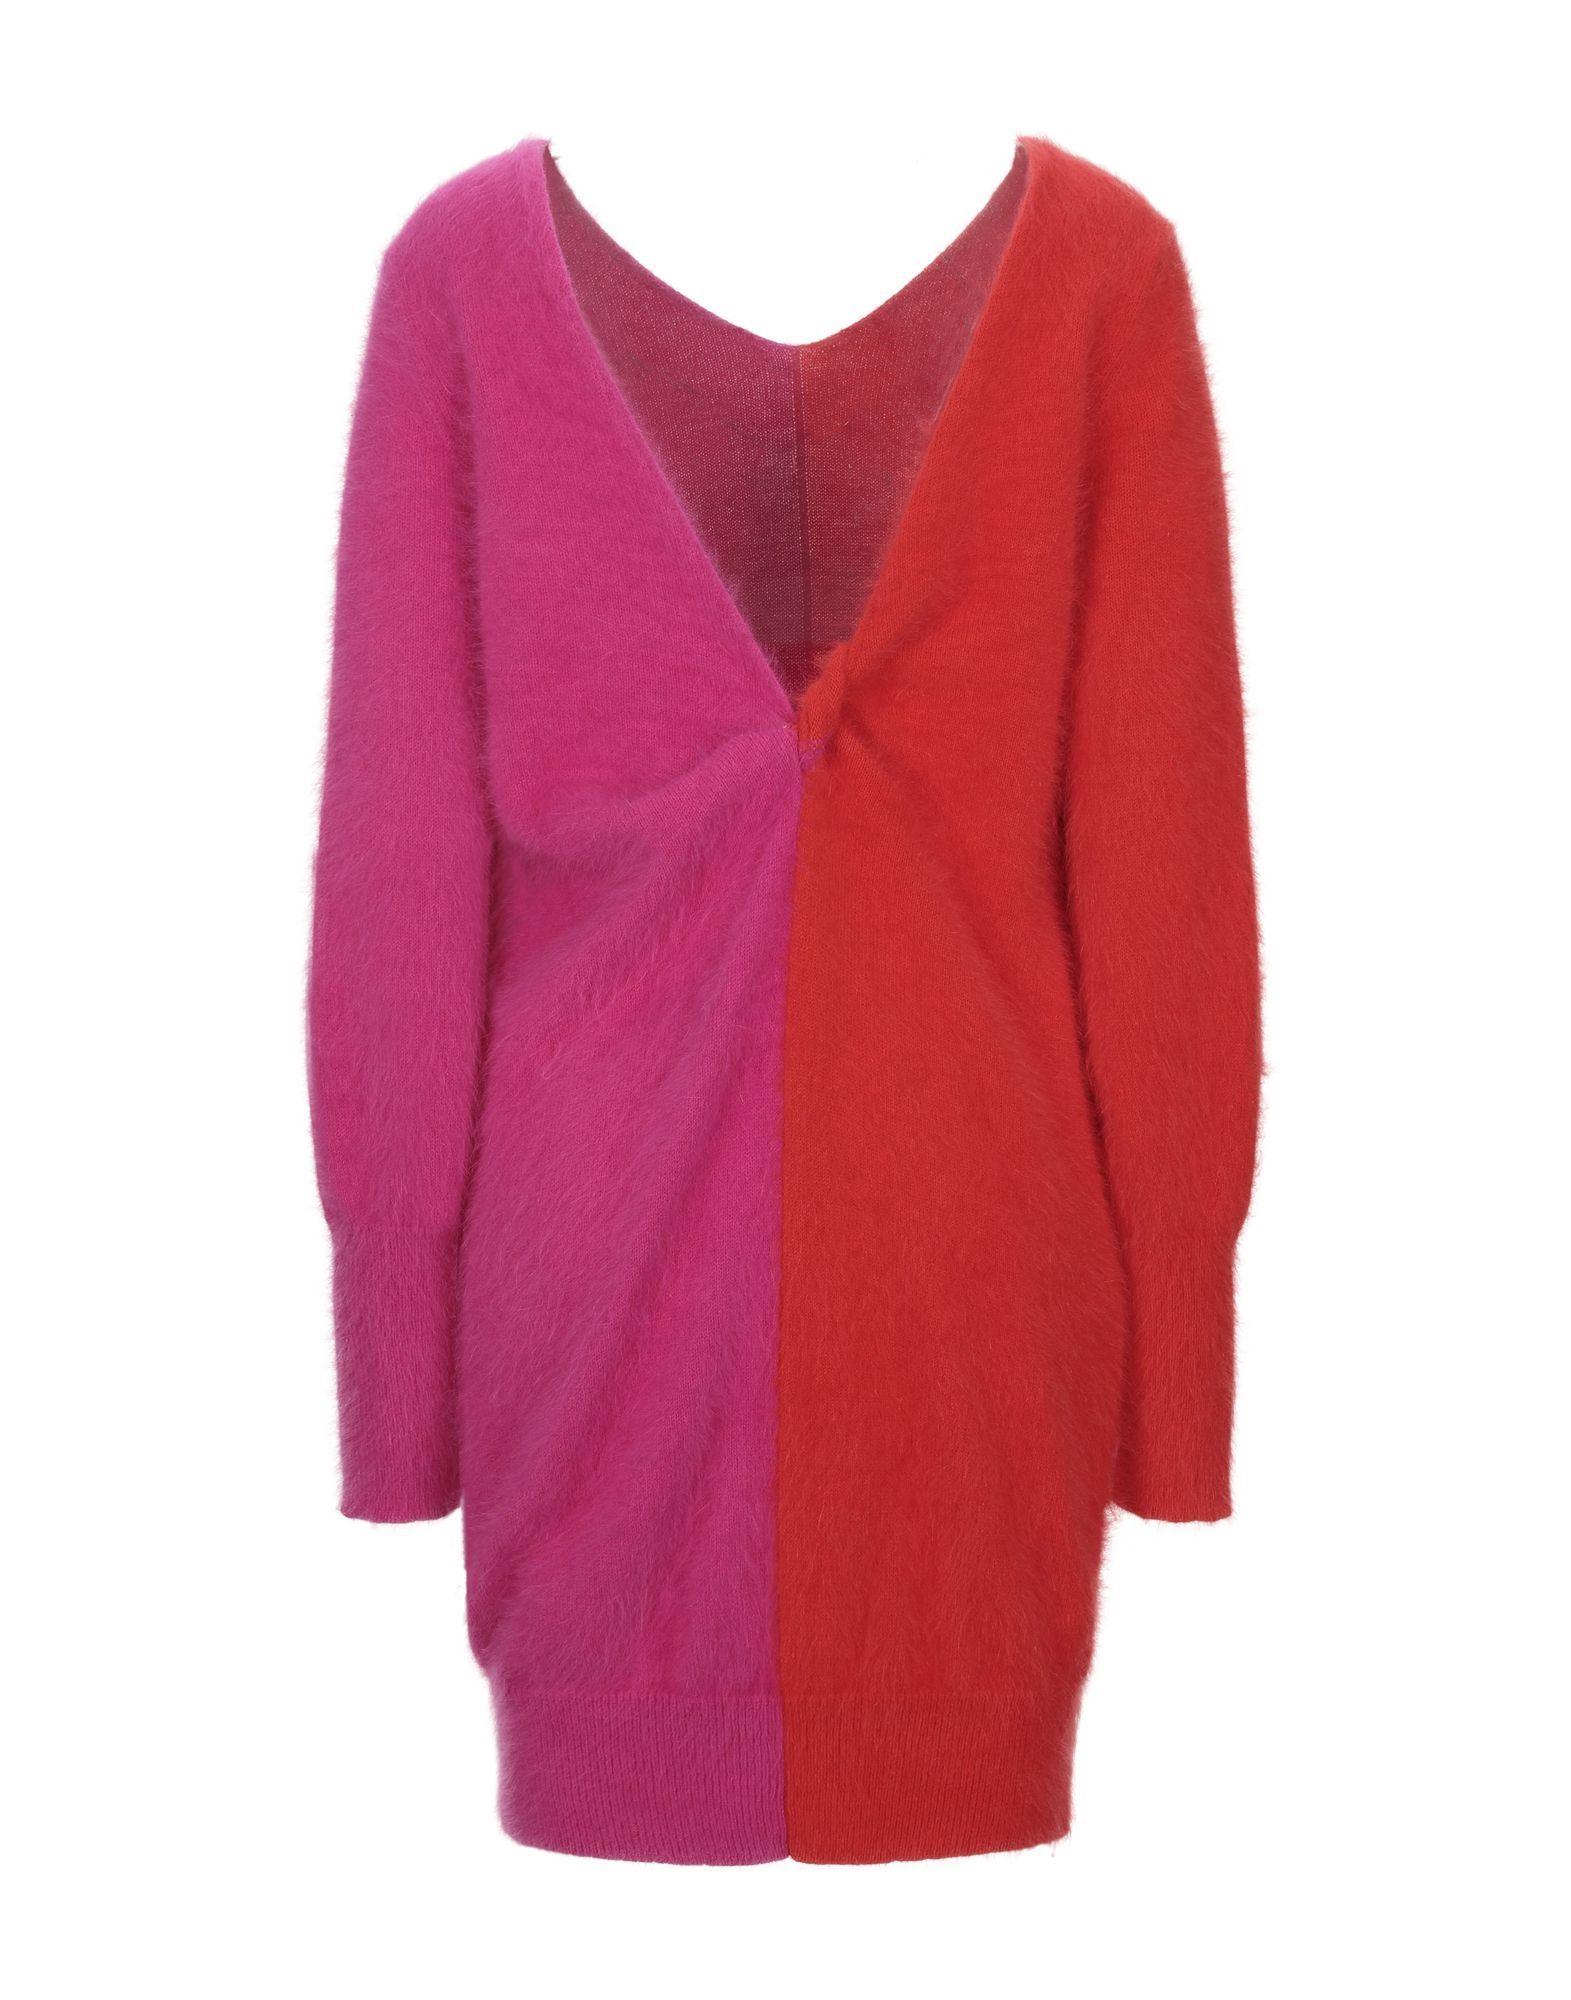 Knitwear Antonino Valenti Fuchsia Women's Angora